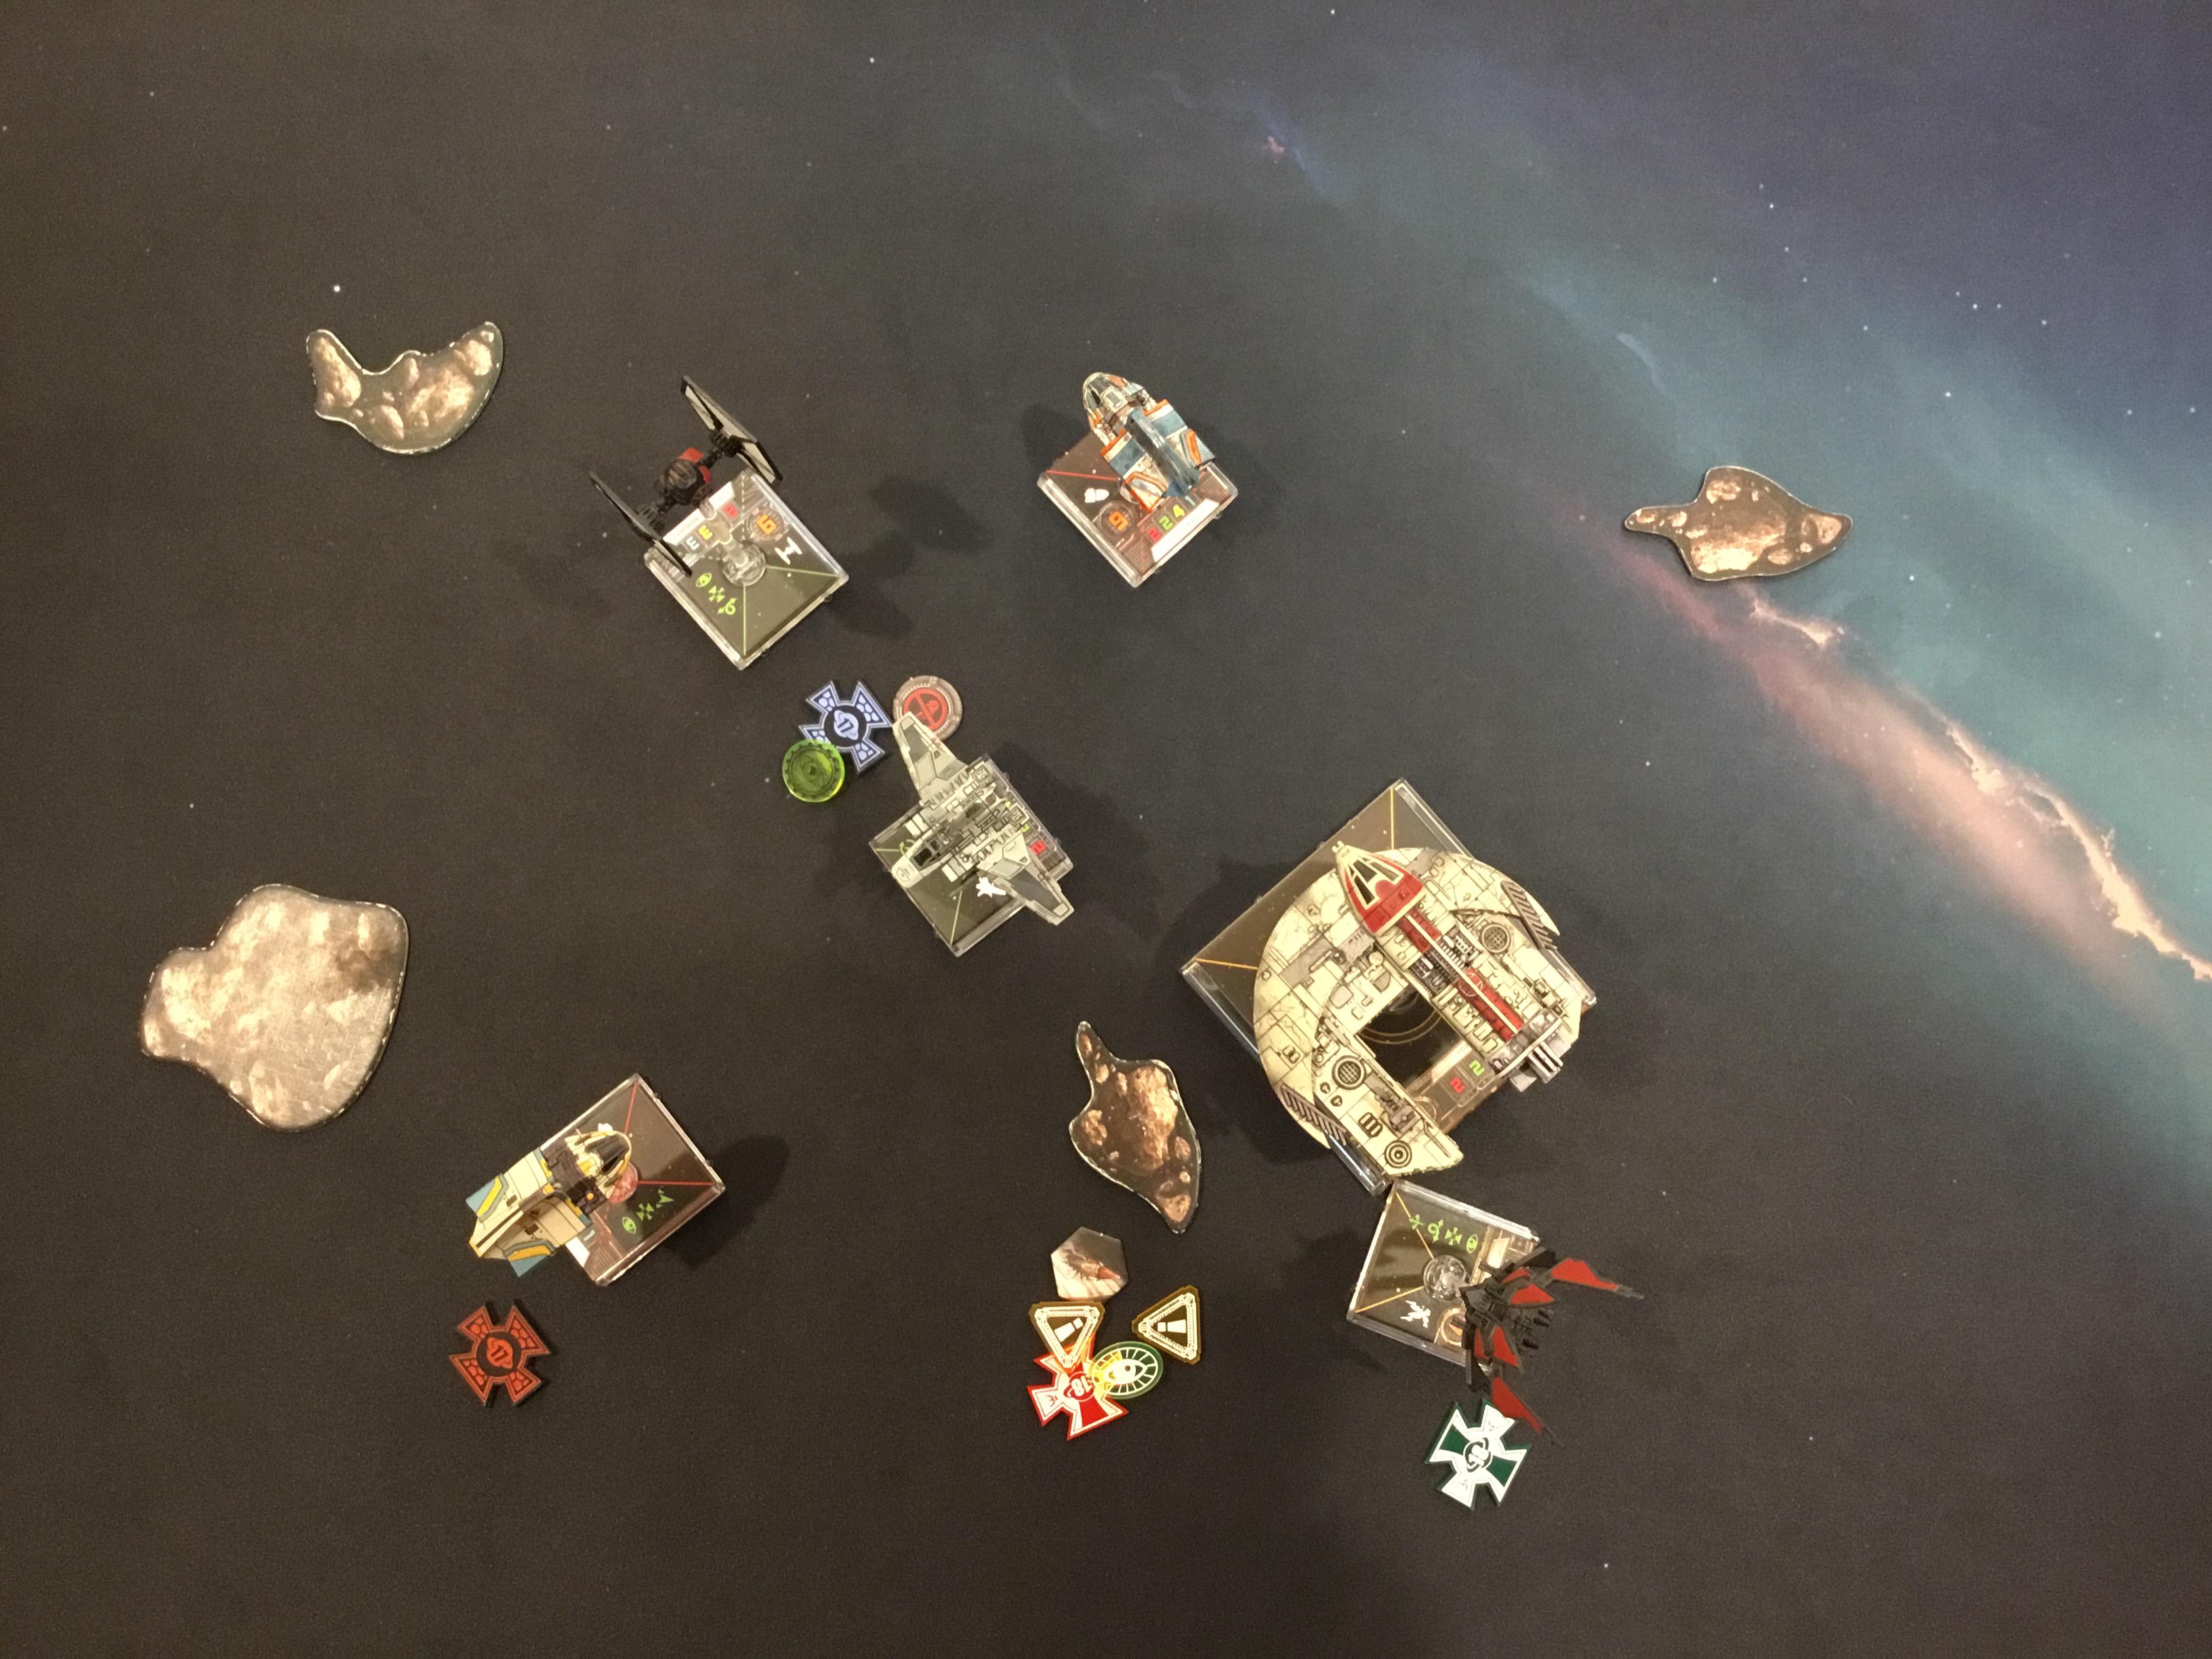 [10.06.18 Hamburg] Chaos over Barmbek II. A27ae610